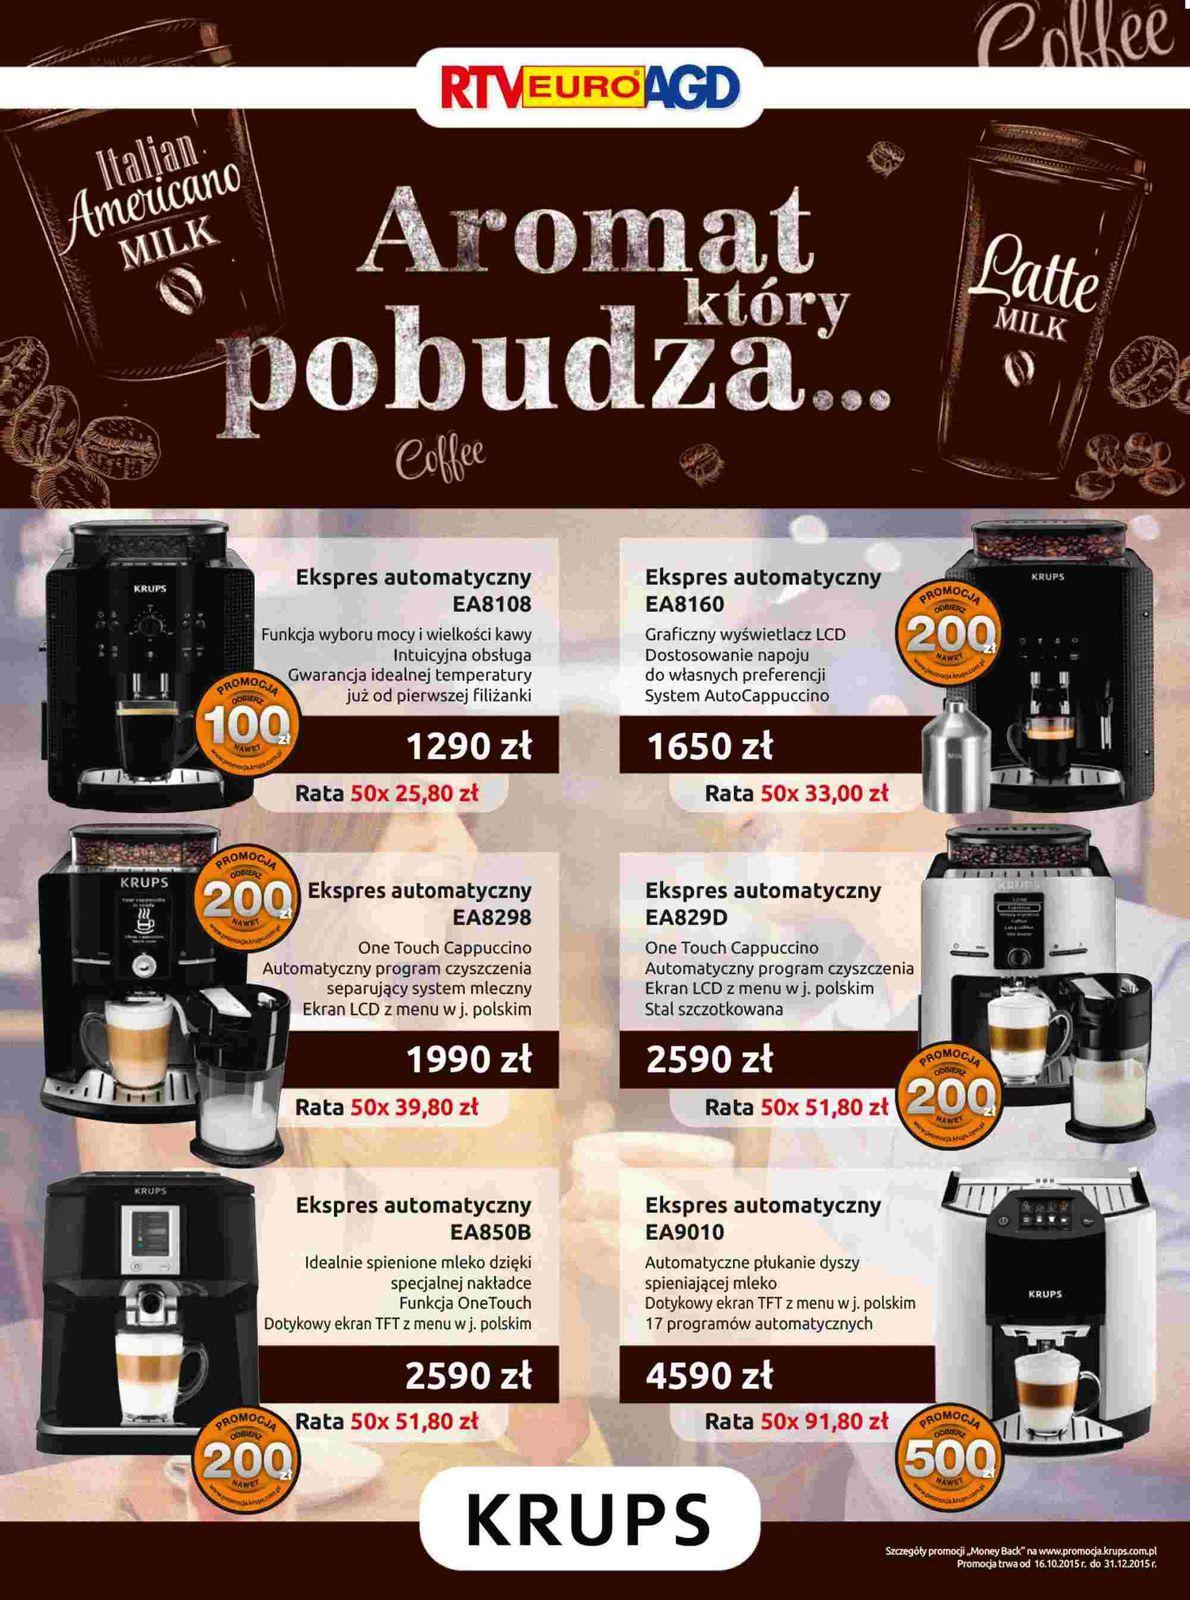 Gazetka promocyjna RTV Euro AGD do 31/12/2015 str.1